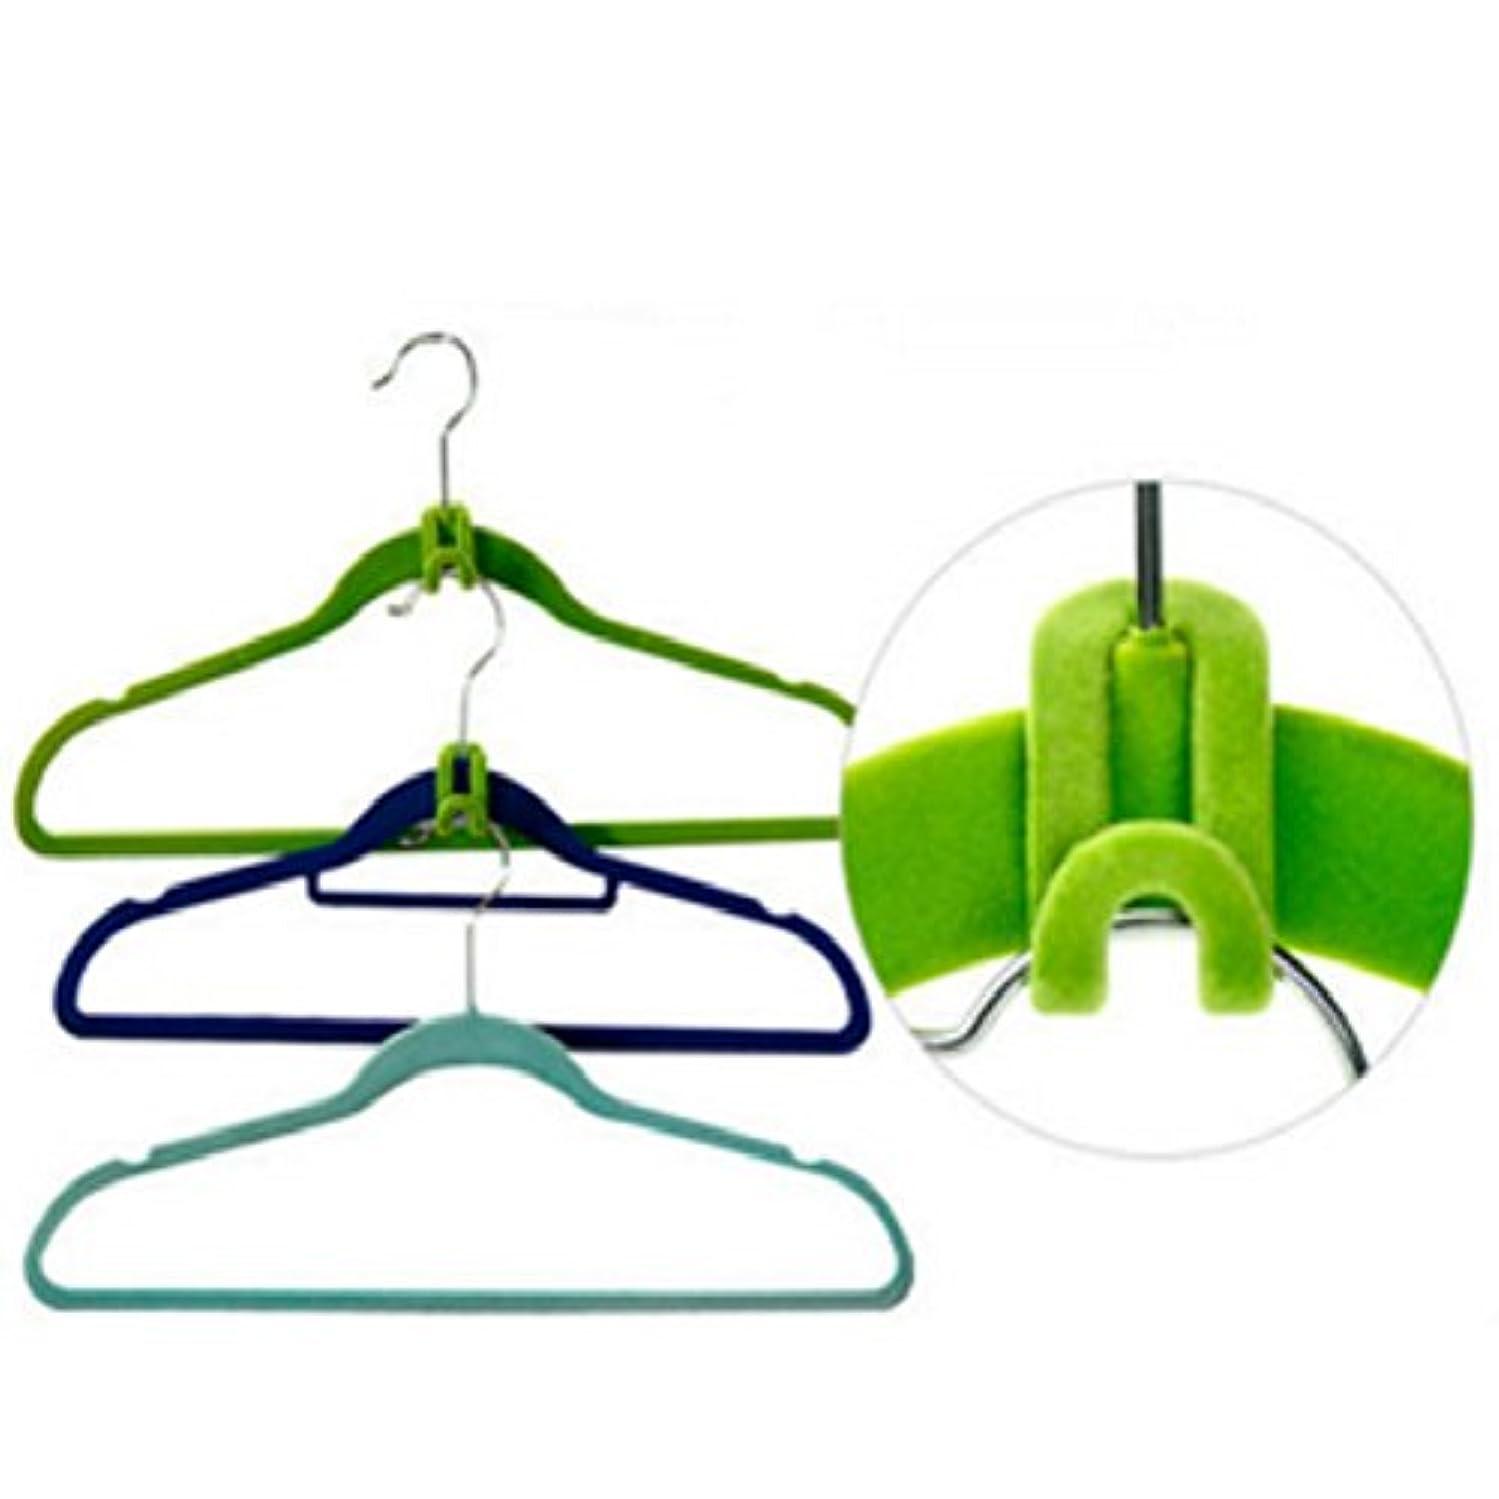 GOSONO 10Pcs/Set Home Creative Mini Flocking Clothes Hanger Flocking Holder Easy Anti-Clip Hook Closet Organizer